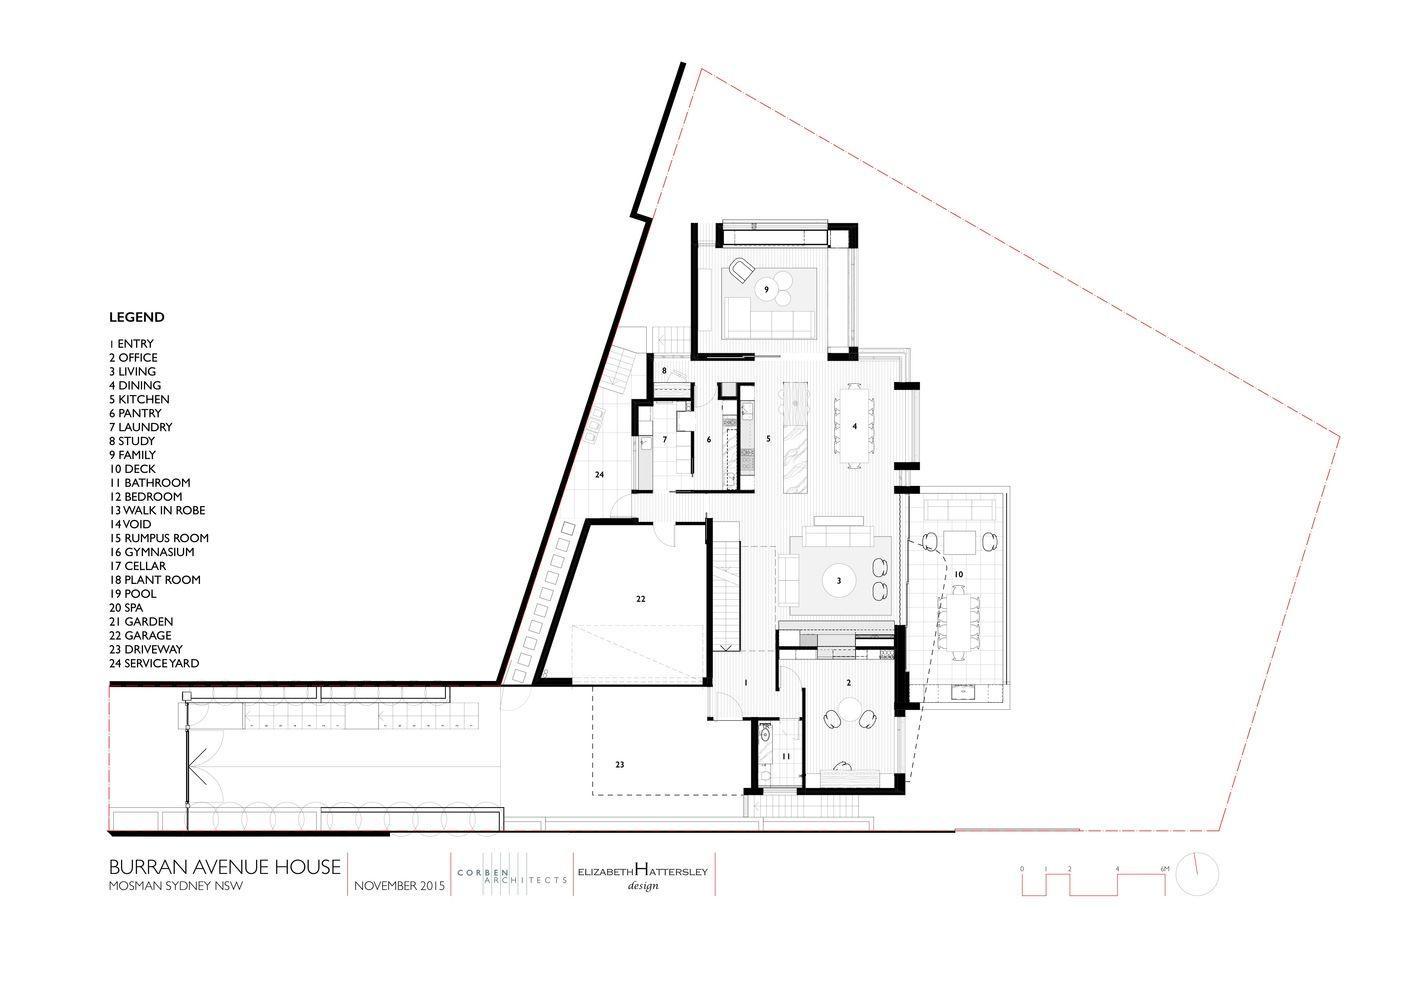 Galeria De Mds Corben Architects